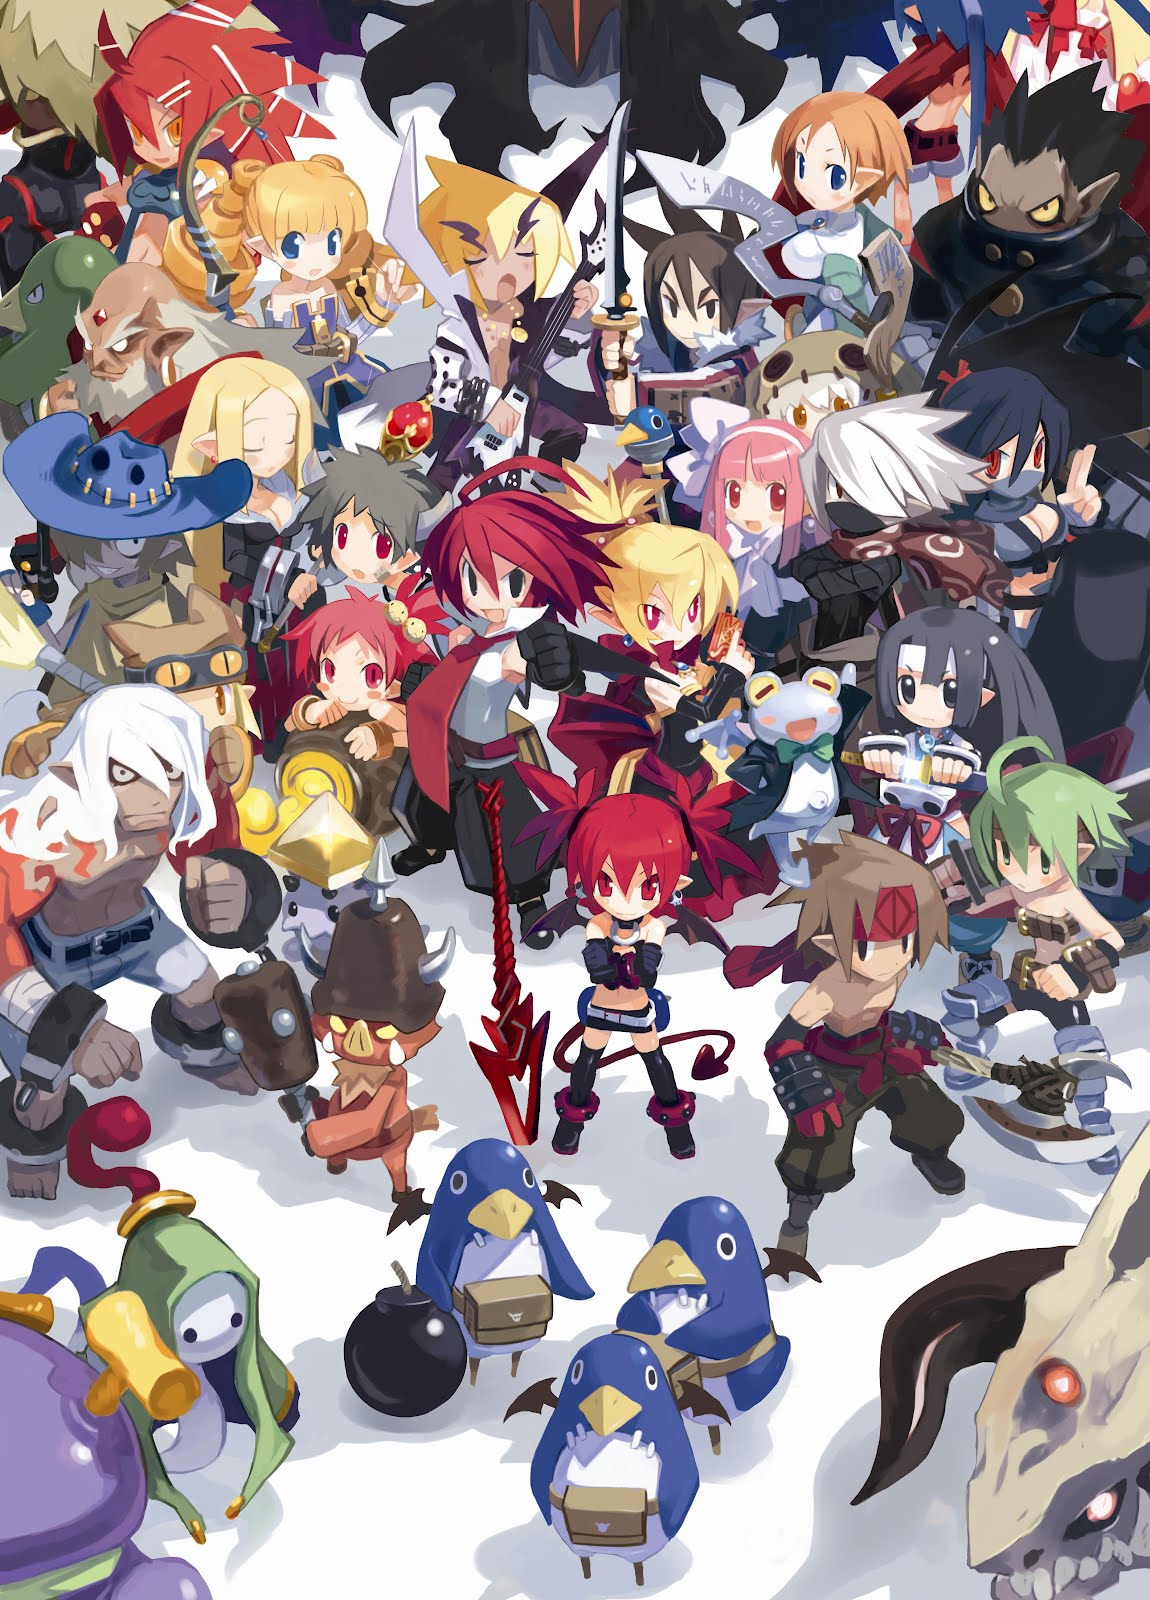 Anime Game Seperti Overlord Manga My Life